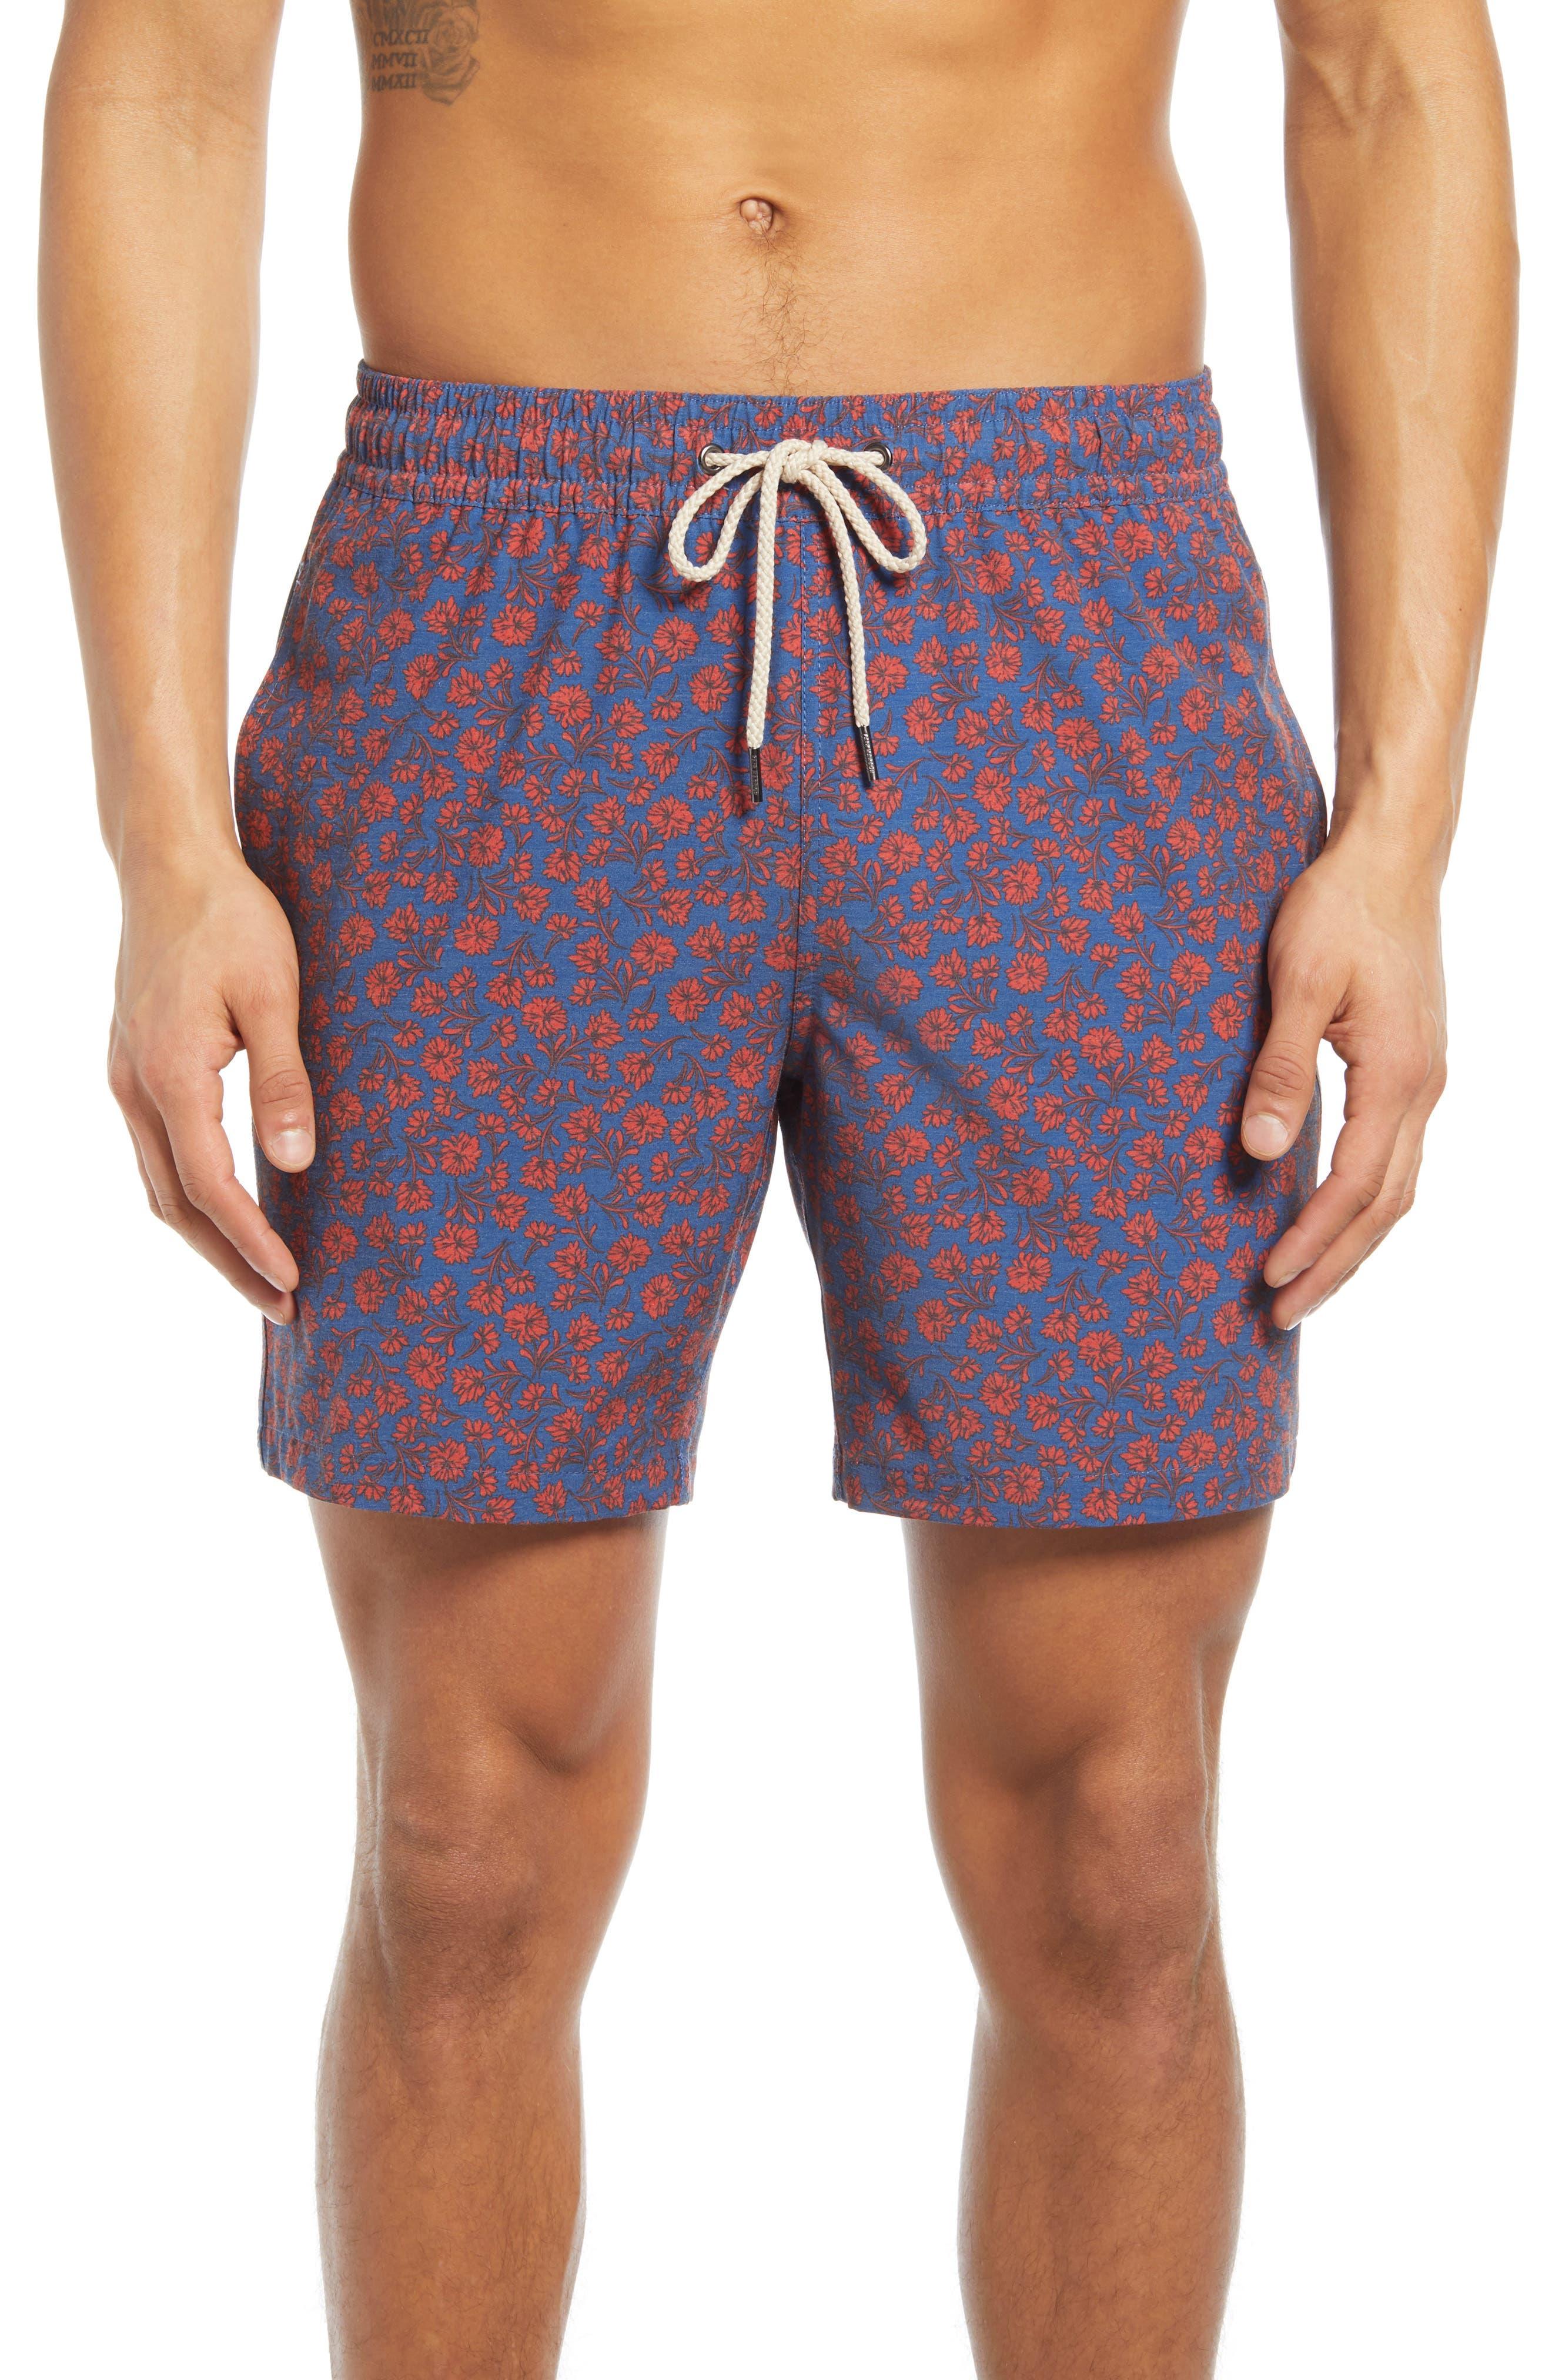 JATOBO Men Swim Briefs Bikini Spotted Trunks Swimming Triangle Shorts Beach Shorts Swimsuit Bathing Suit Swimwear for Men